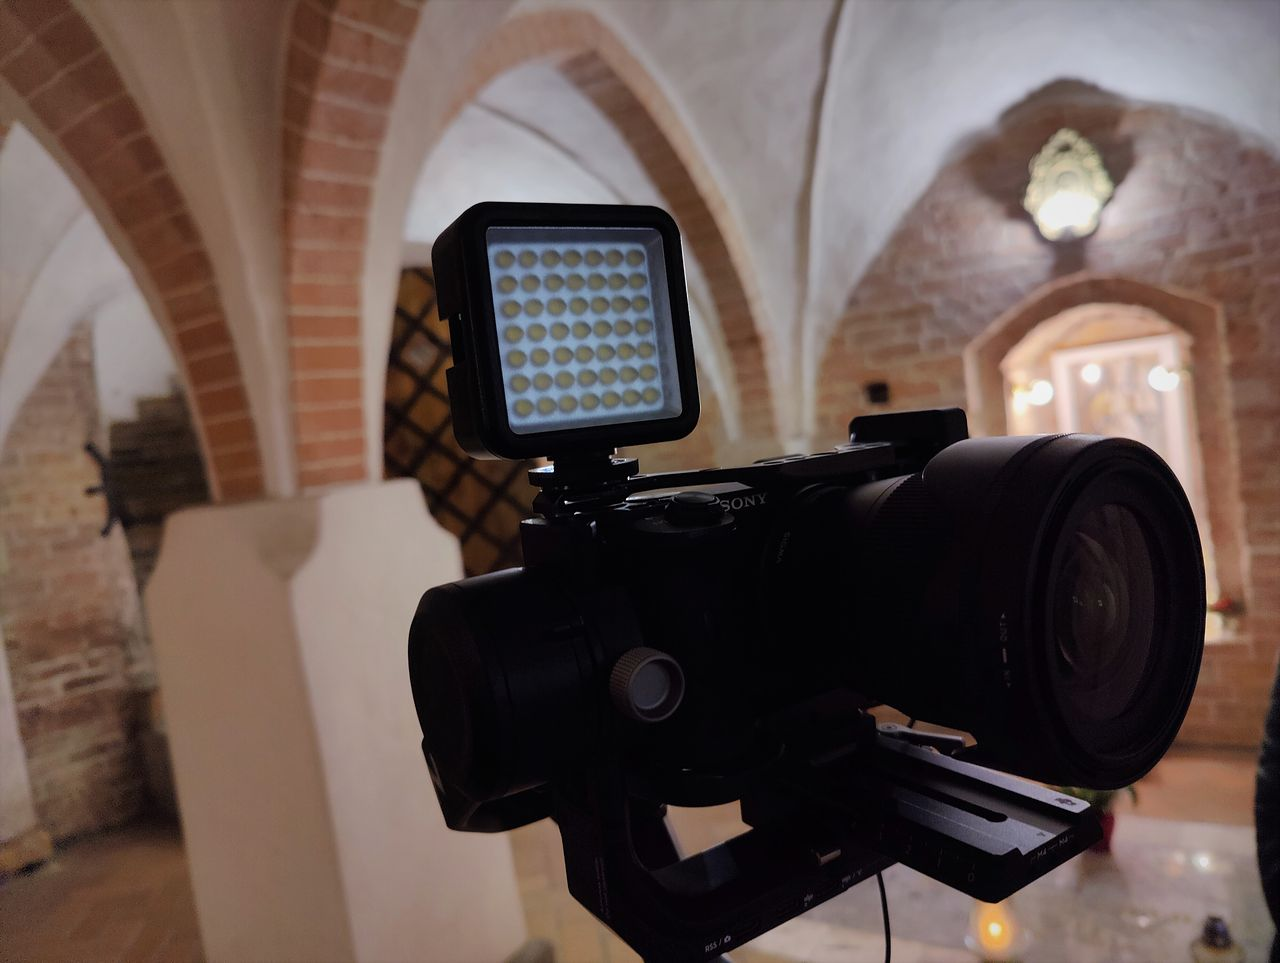 Lampki doświetlające Natec ALFAMA LED LIGHT i LED COLOR do aparatów oraz kamer - Ronin + a6600 + sigma 16 mm + LED LIGHT